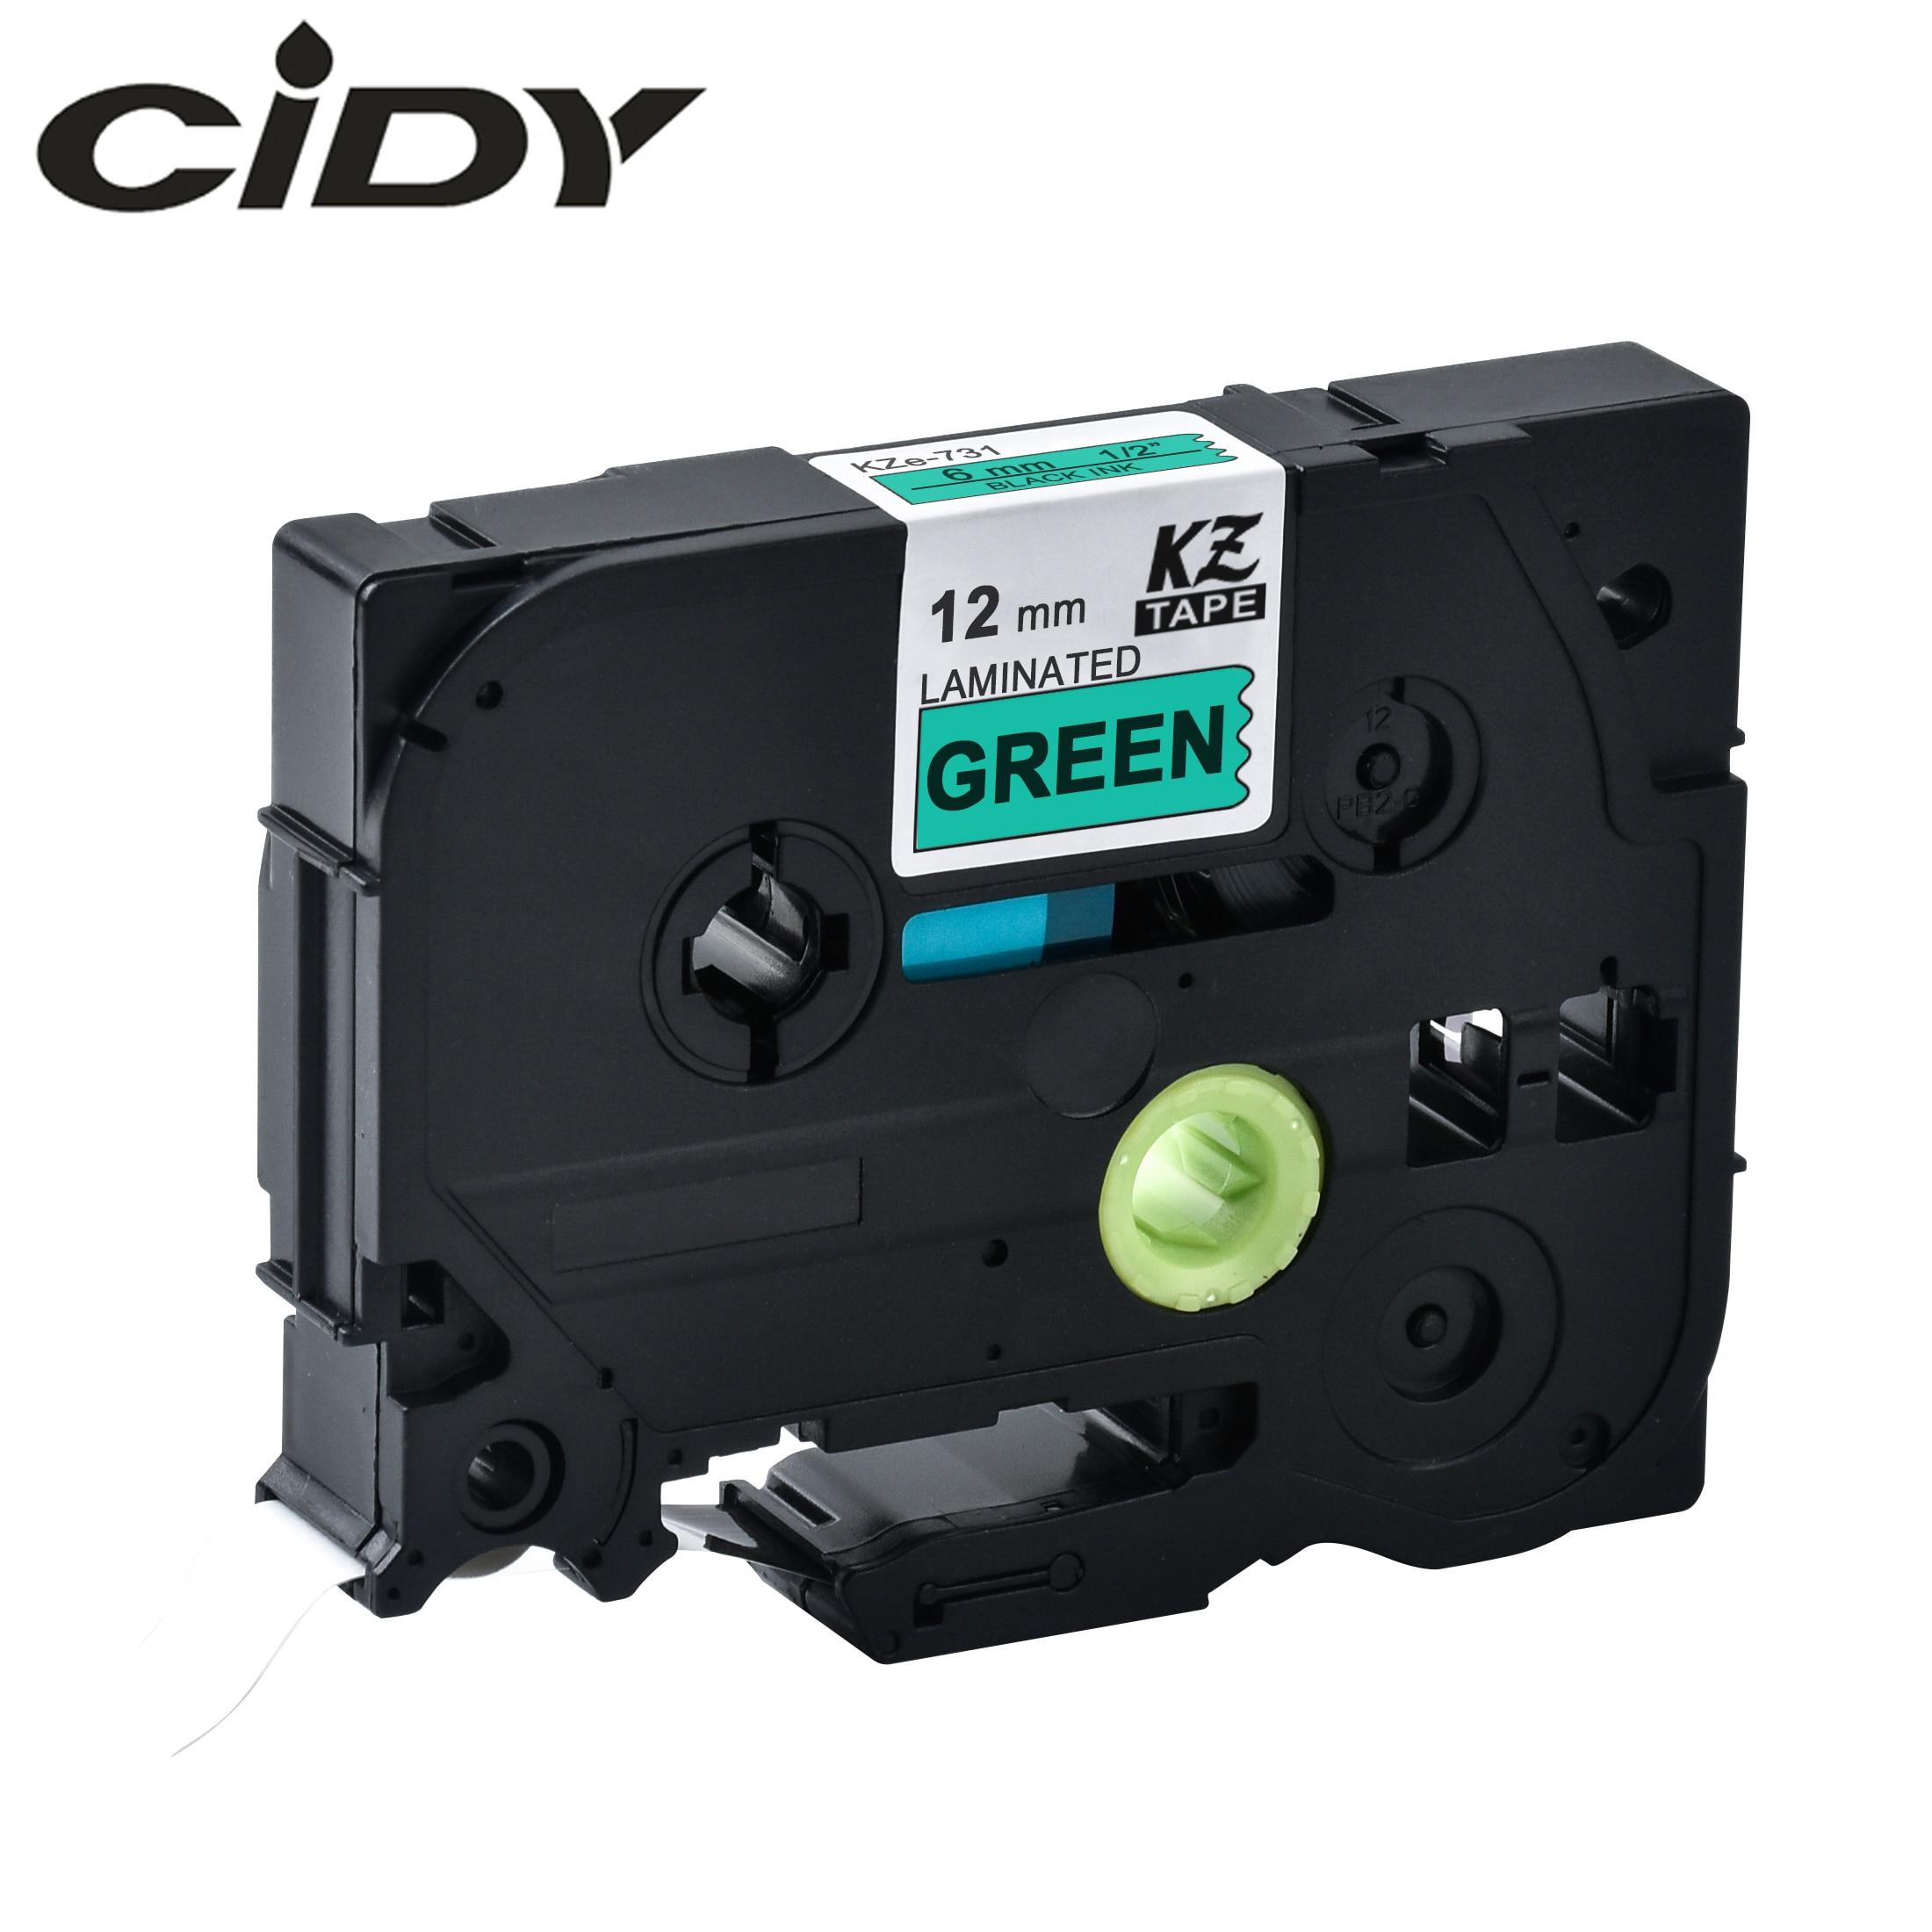 Cidy tze 731 tz731 preto no verde laminado compatível p toque 12mm tze-731 tz-731 tze731 etiqueta fita cassete cartucho